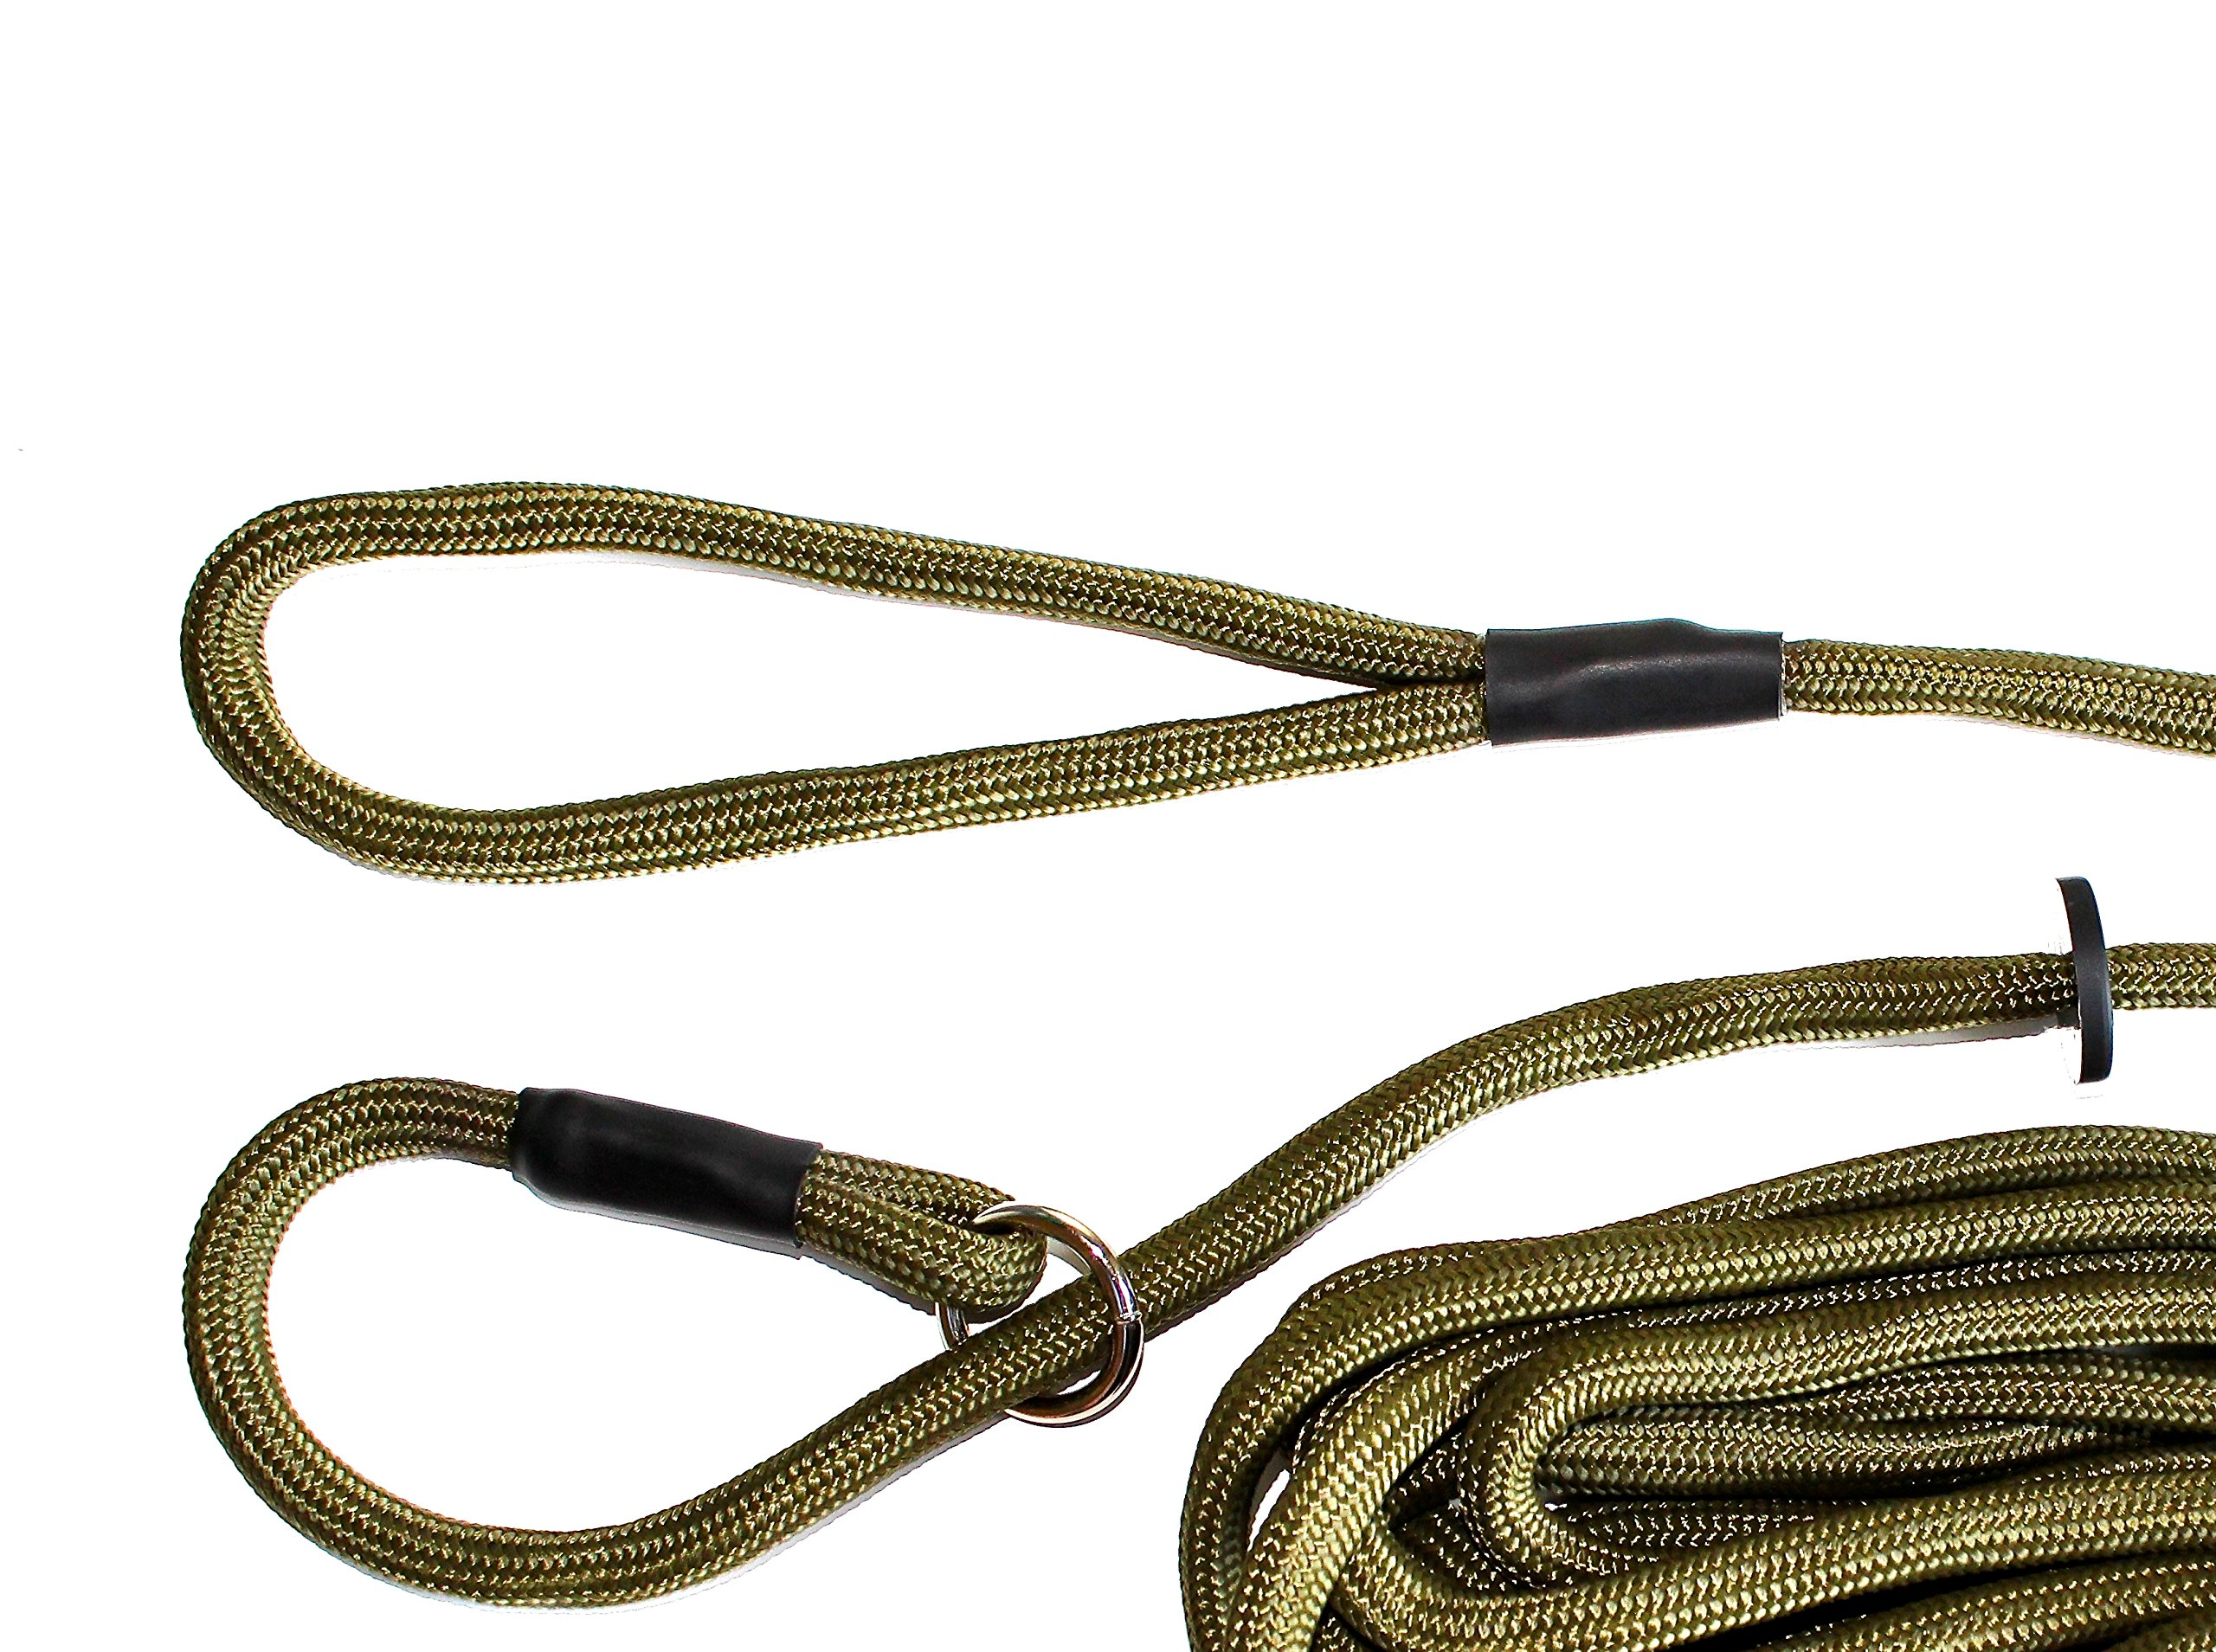 Dog & Field Training Lead - 20 Ft Long Training/Exercise Lead - Soft Braided Nylon